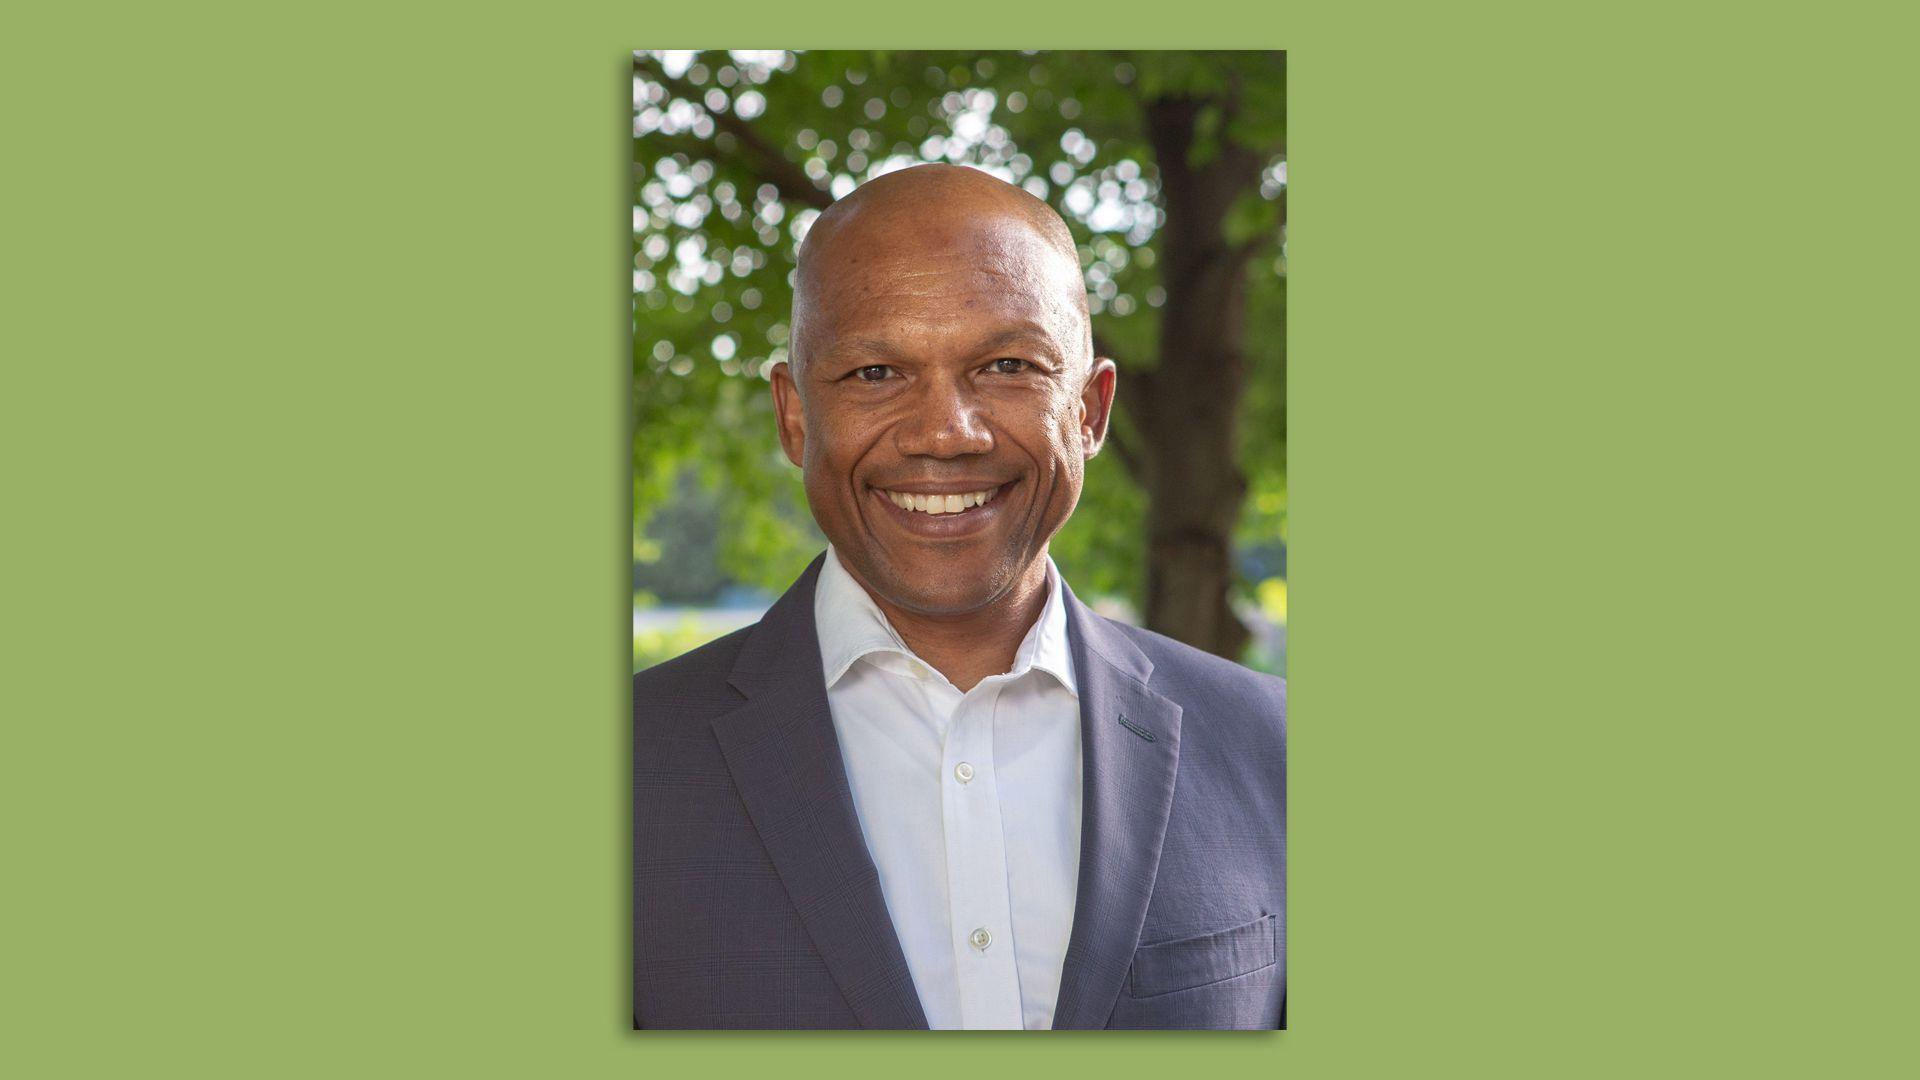 A headshot of Iowa Democratic Party Chair Ross Wilburn.